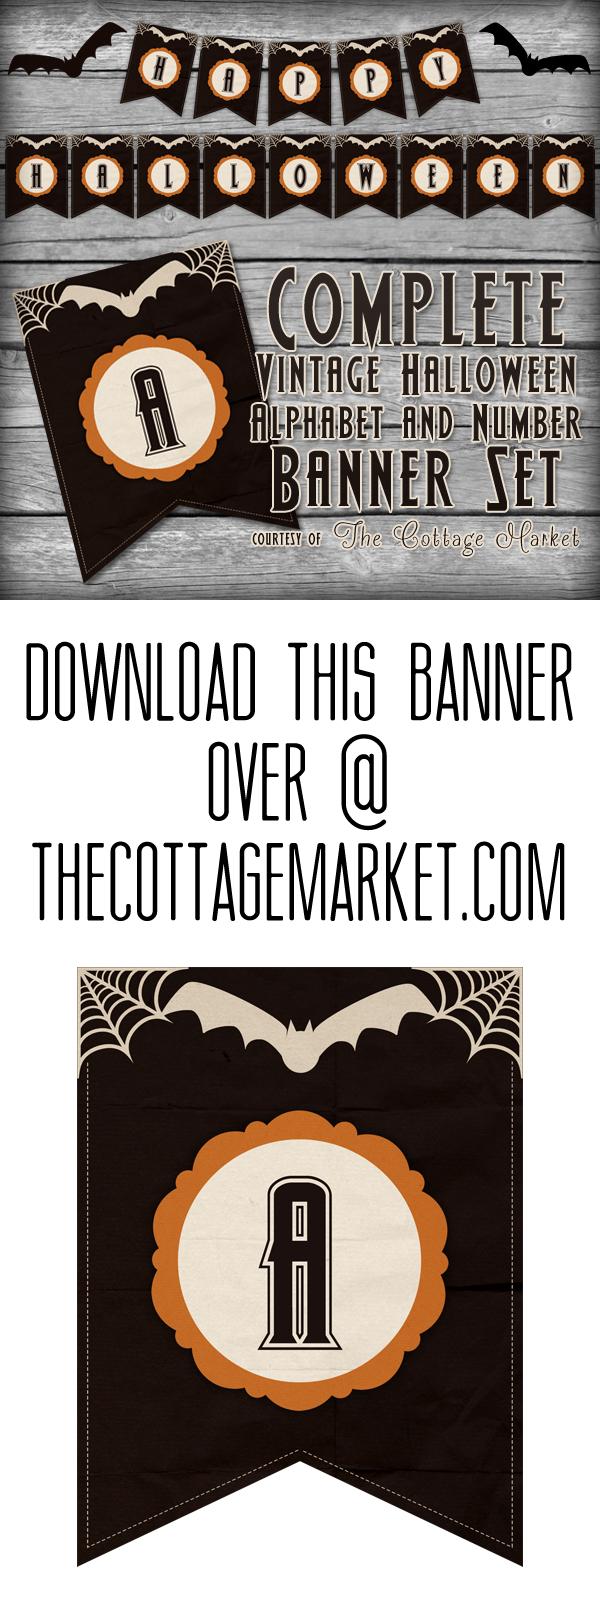 Free Printable Halloween Banner Set | The Cottage Market - Free Printable Halloween Banner